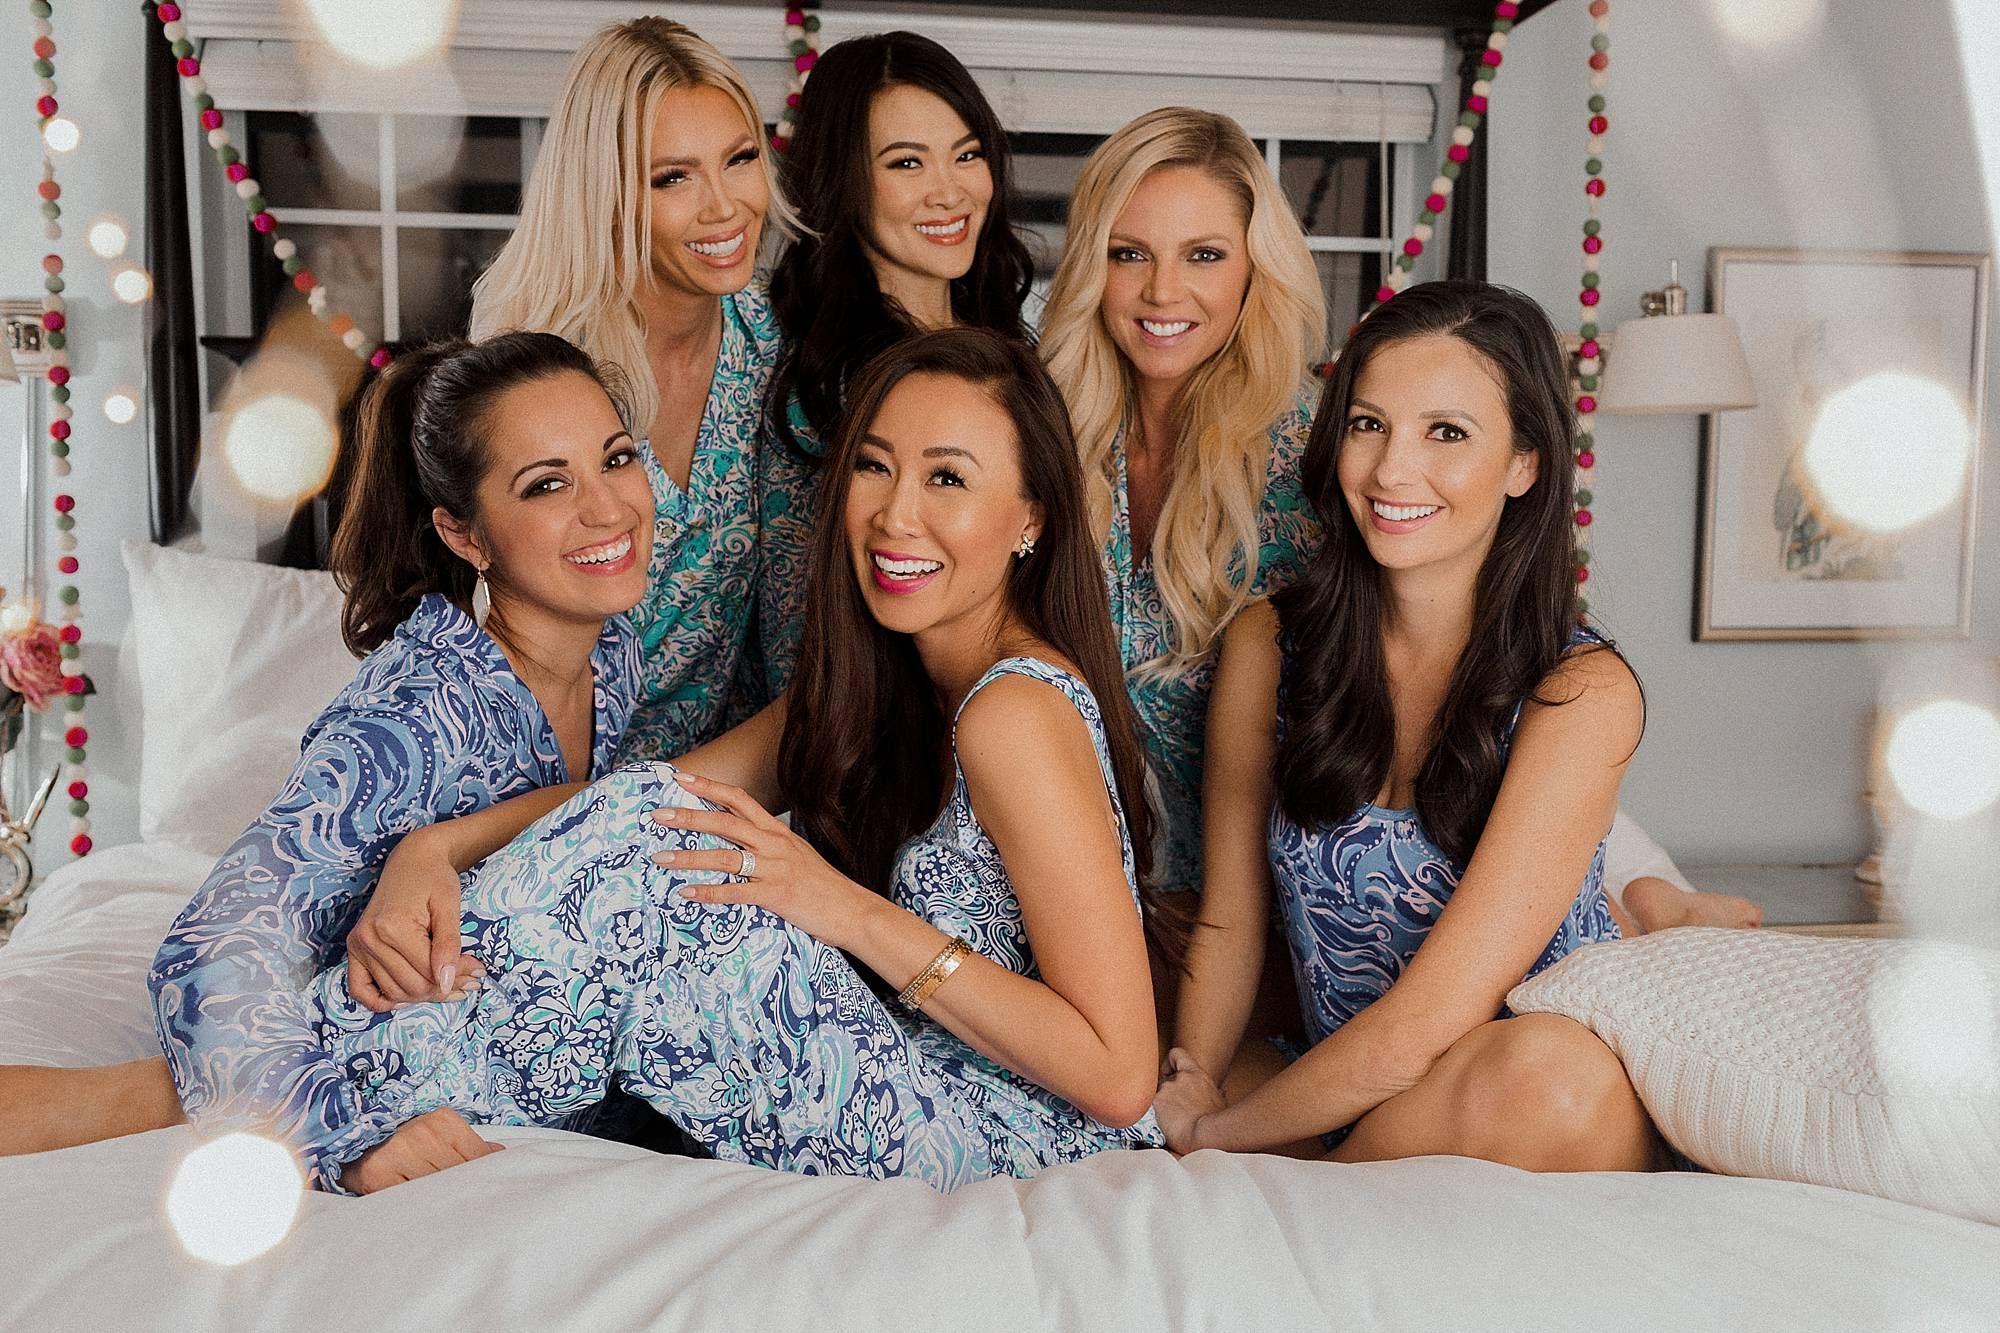 Lilly Pulitzer pajama party 2018 girls pajama Christmas party girls on bed sleepover - lifestyle blogger Diana elizabeth